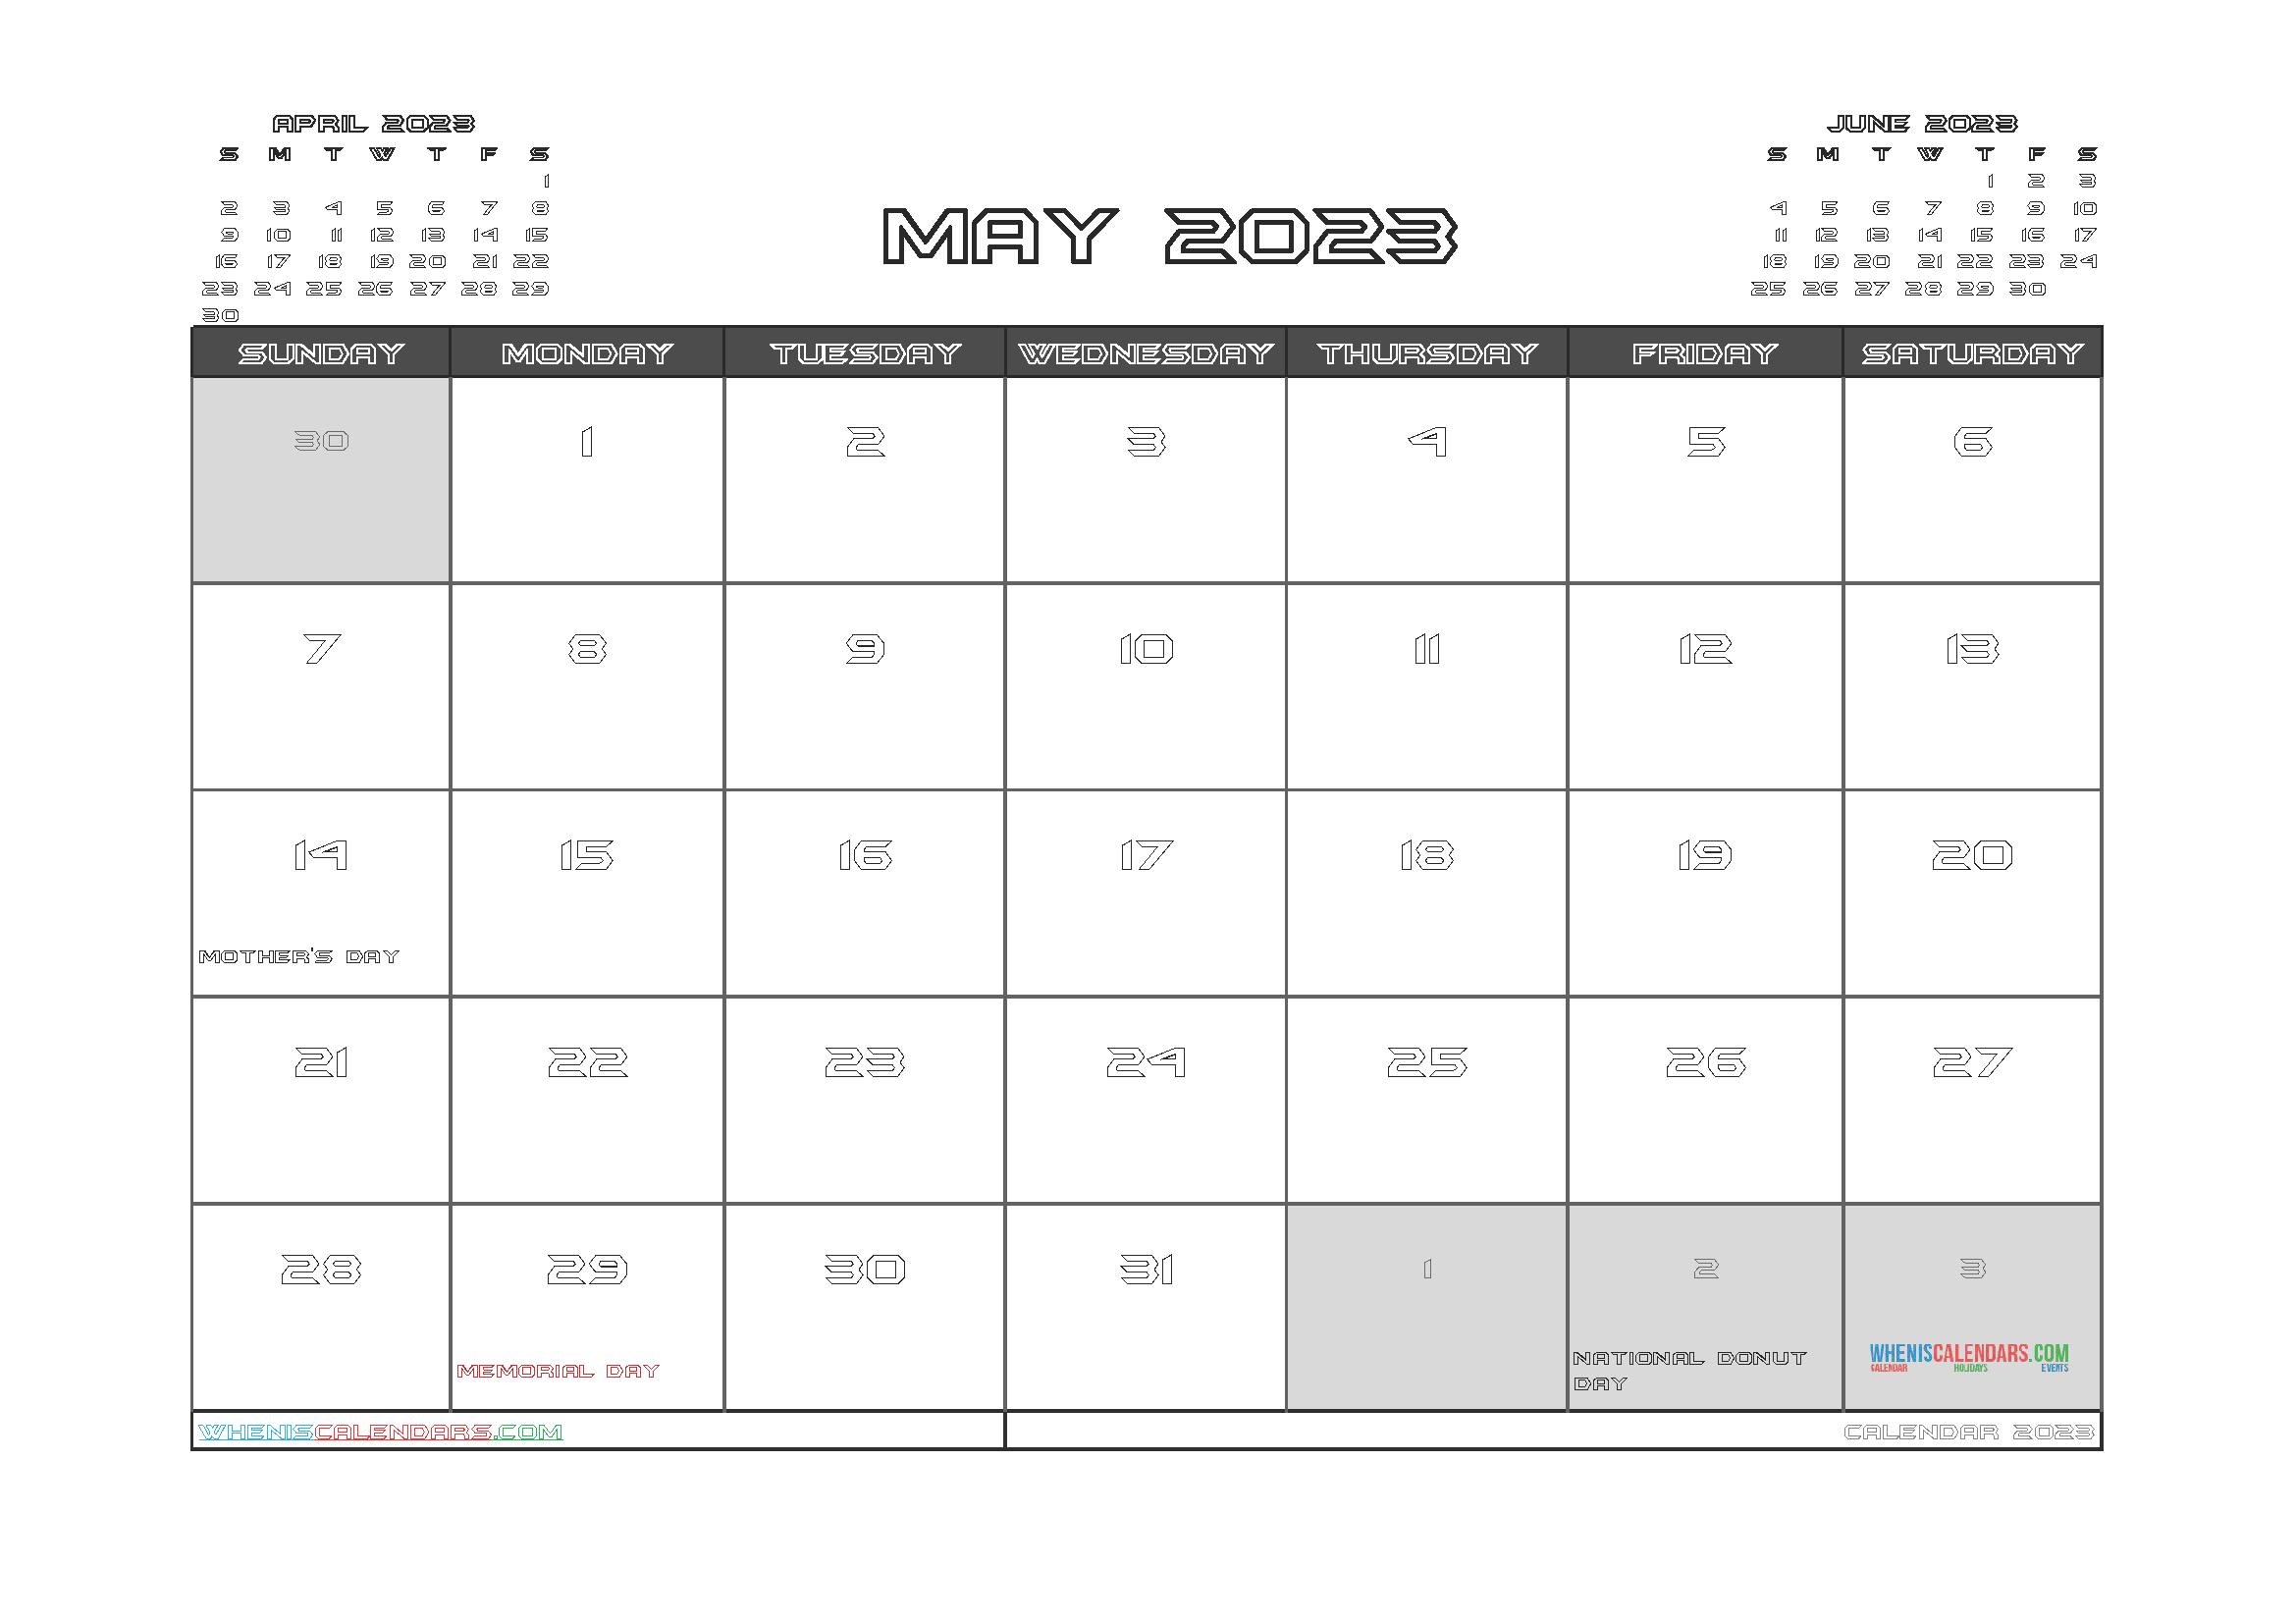 Free Editable Calendar May 2023 PDF